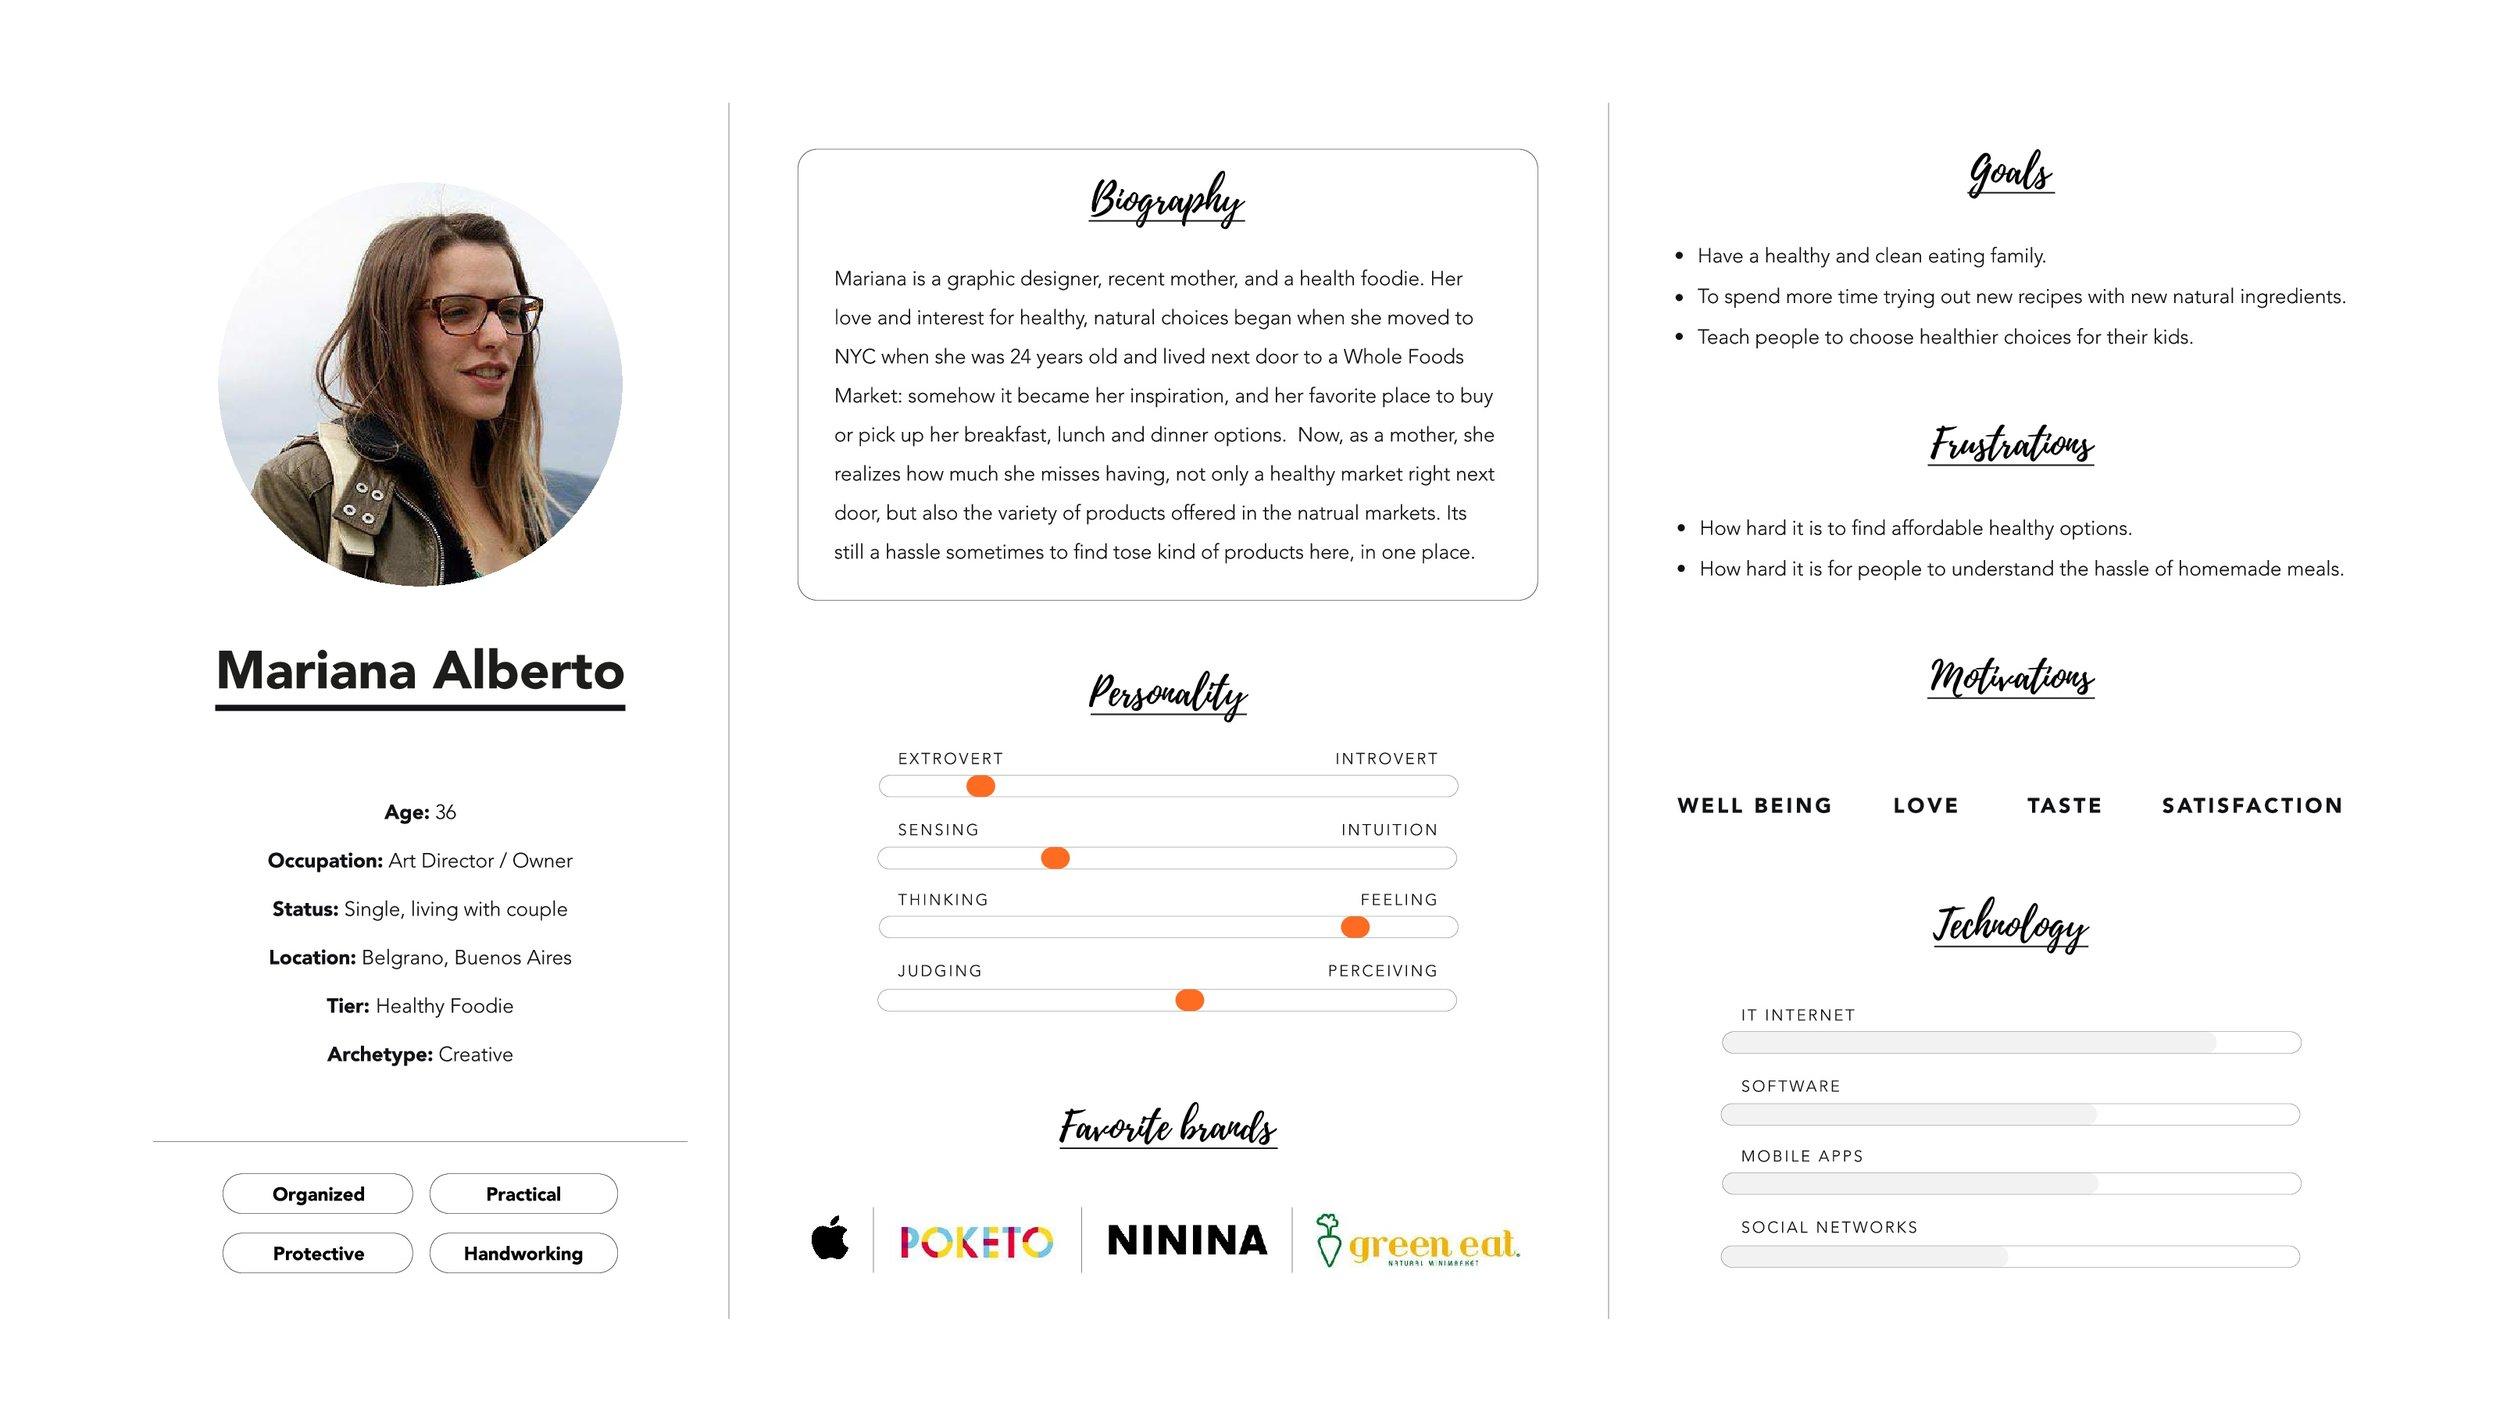 Guada-Final-Presentation2.compressed-006.jpg